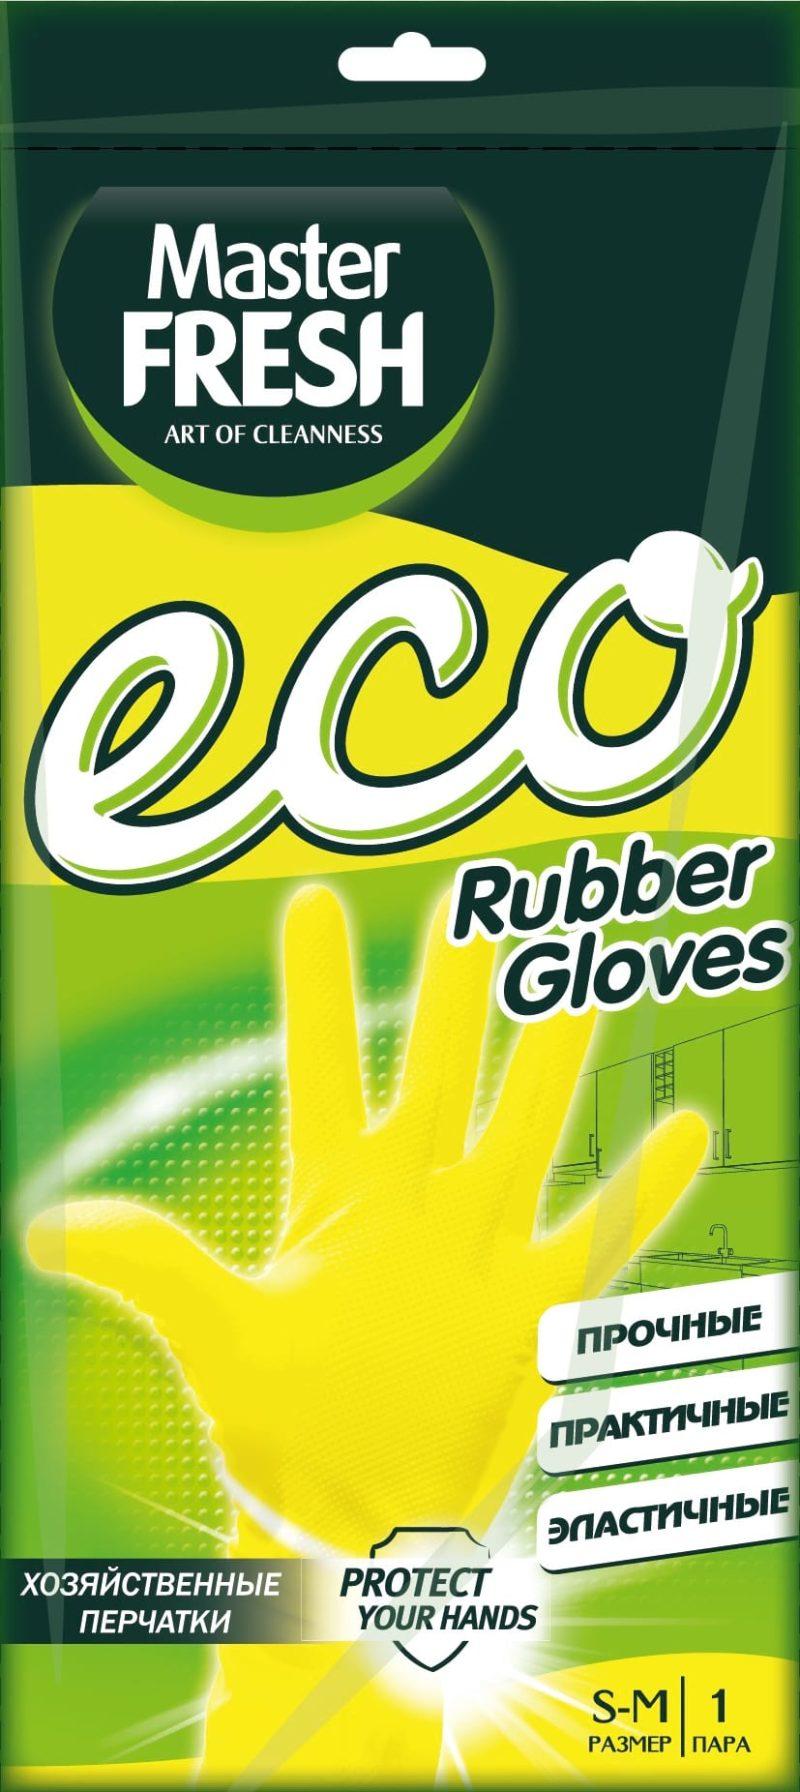 Master FRESH ЭКО хозяйственные перчатки 1 пара (средний размер S/M)